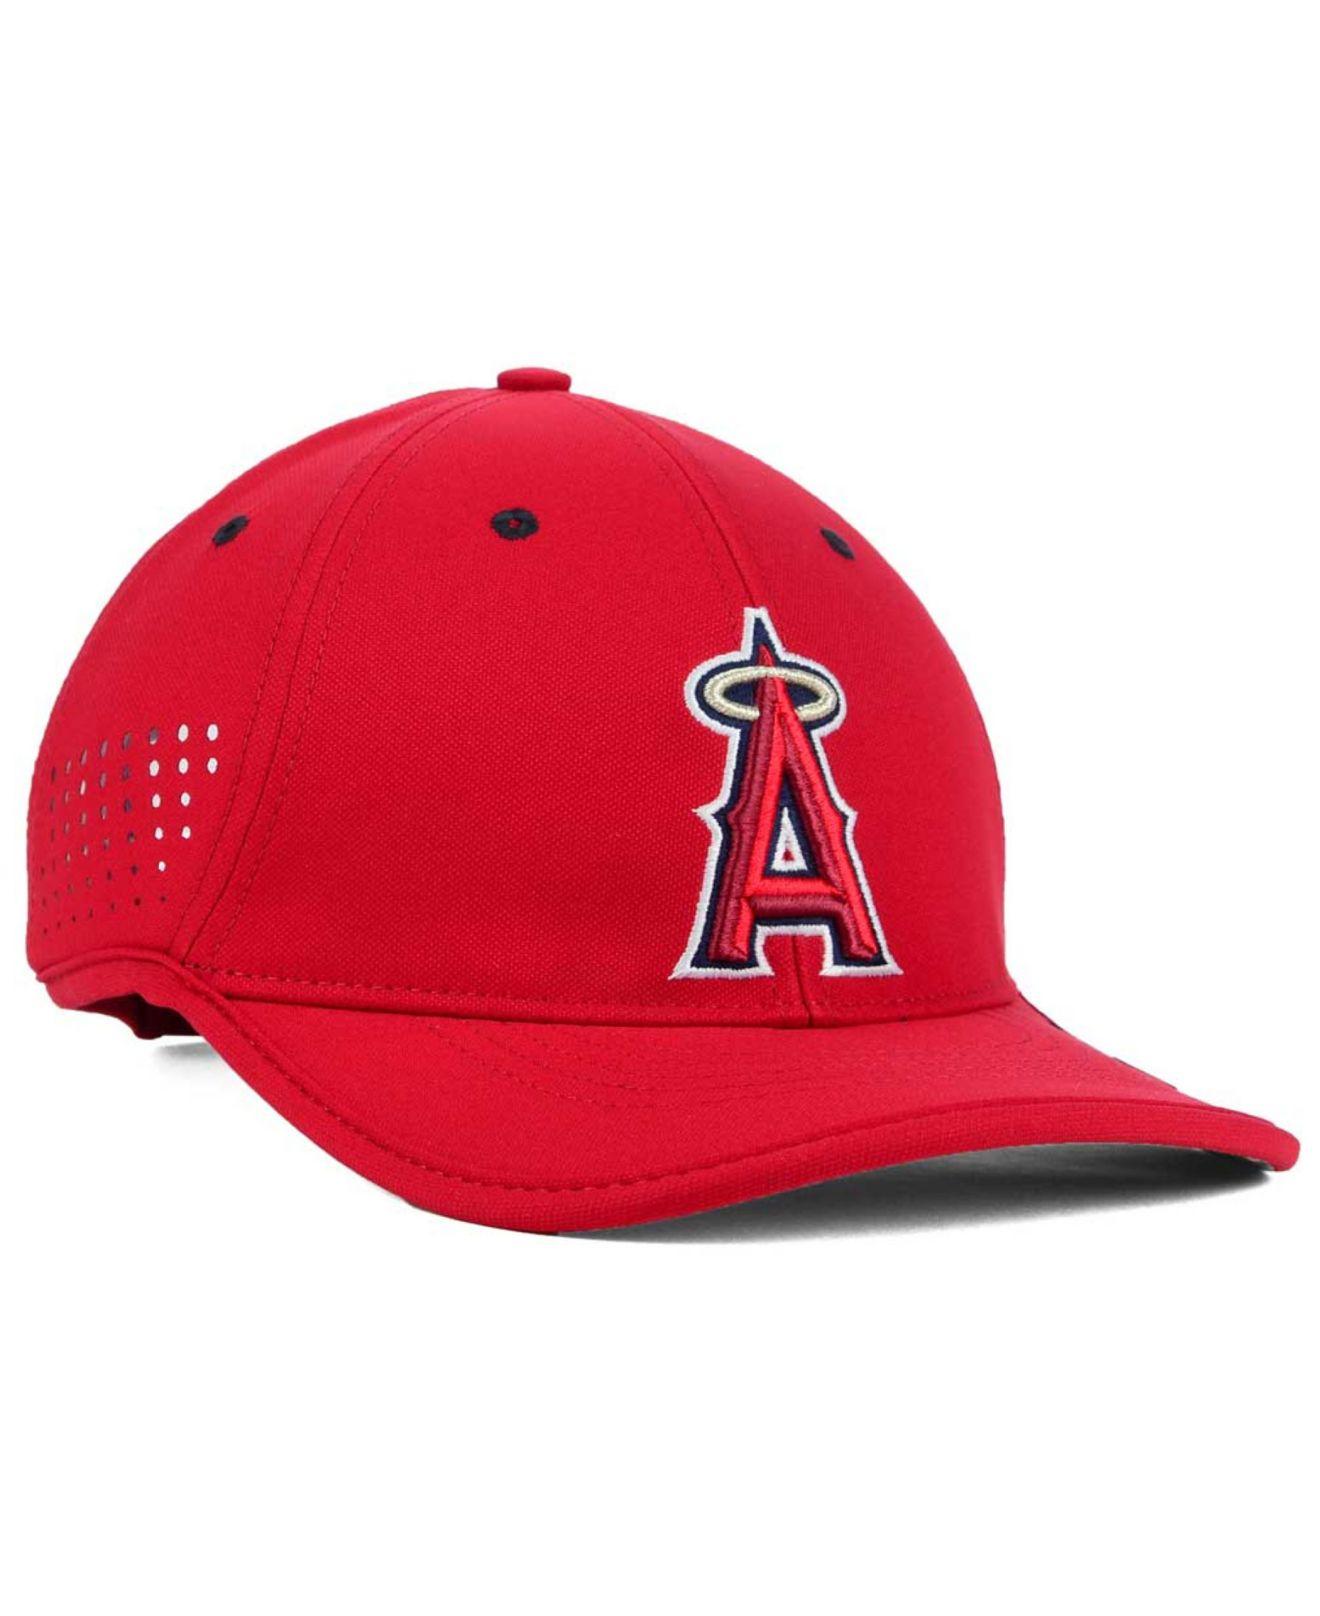 c0779f156d5 Lyst - Nike Los Angeles Angels Of Anaheim Vapor Swoosh Adjustable ...